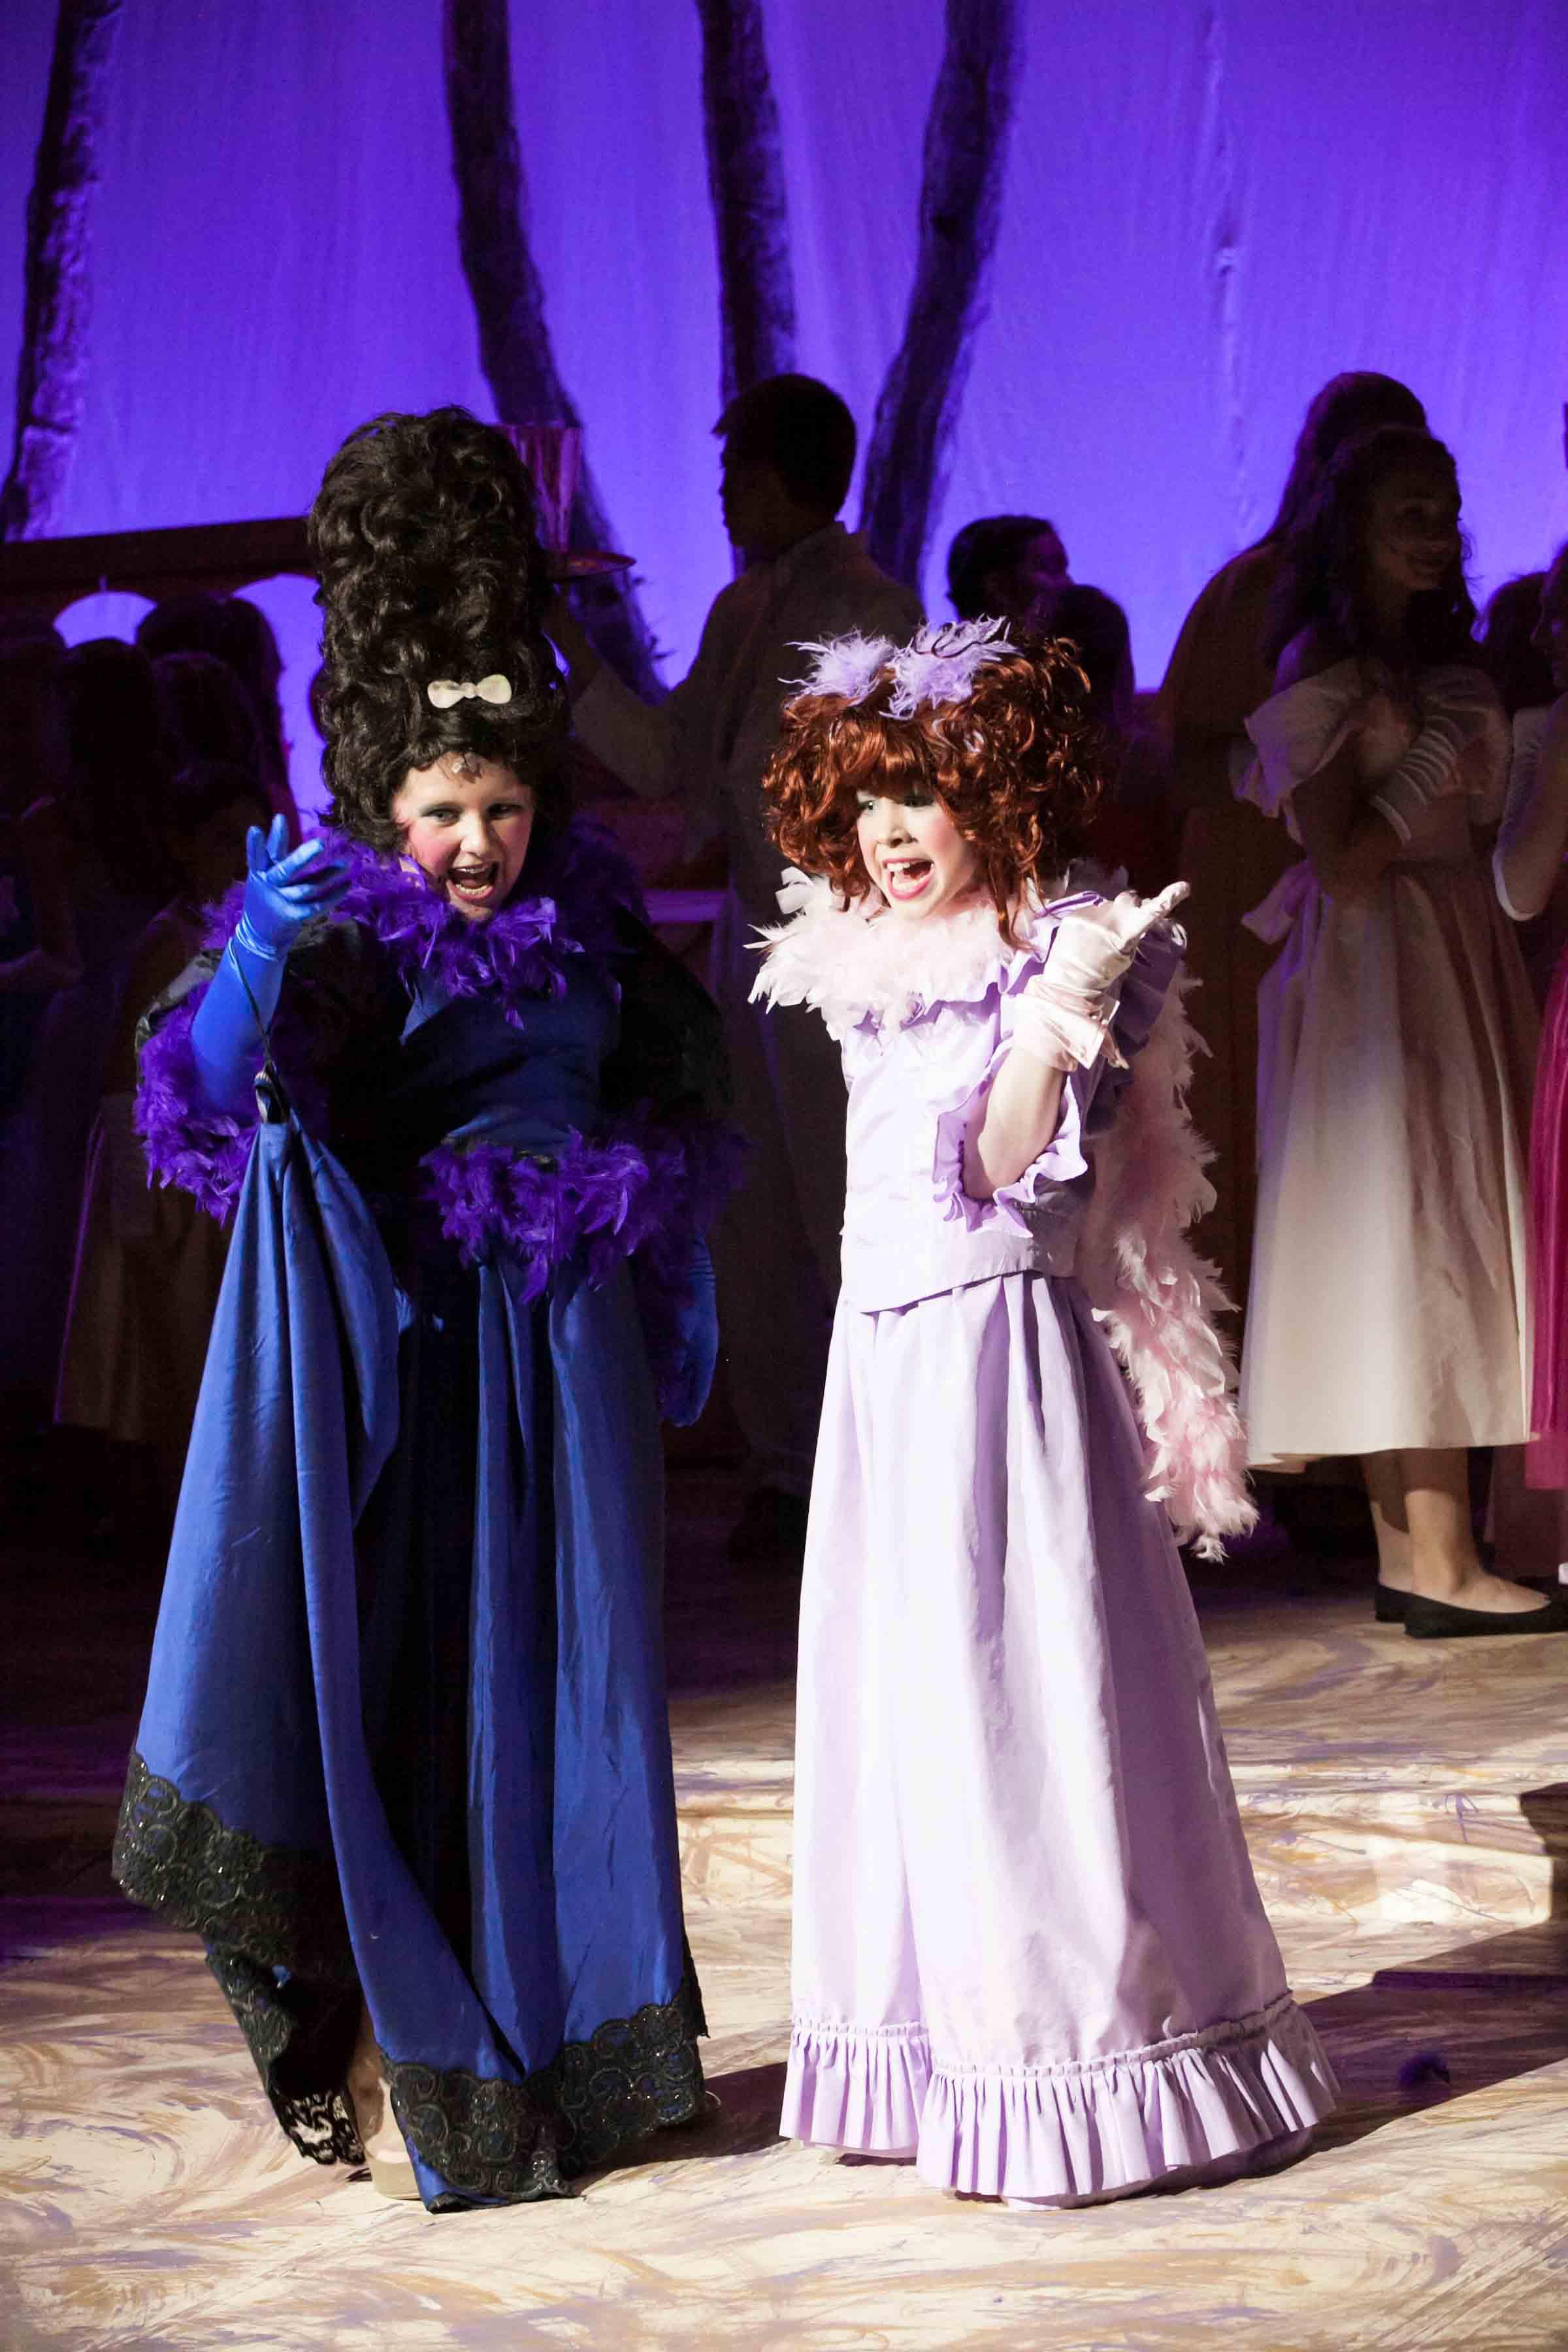 6-6-13 Cinderella Calcutta 0176.jpg